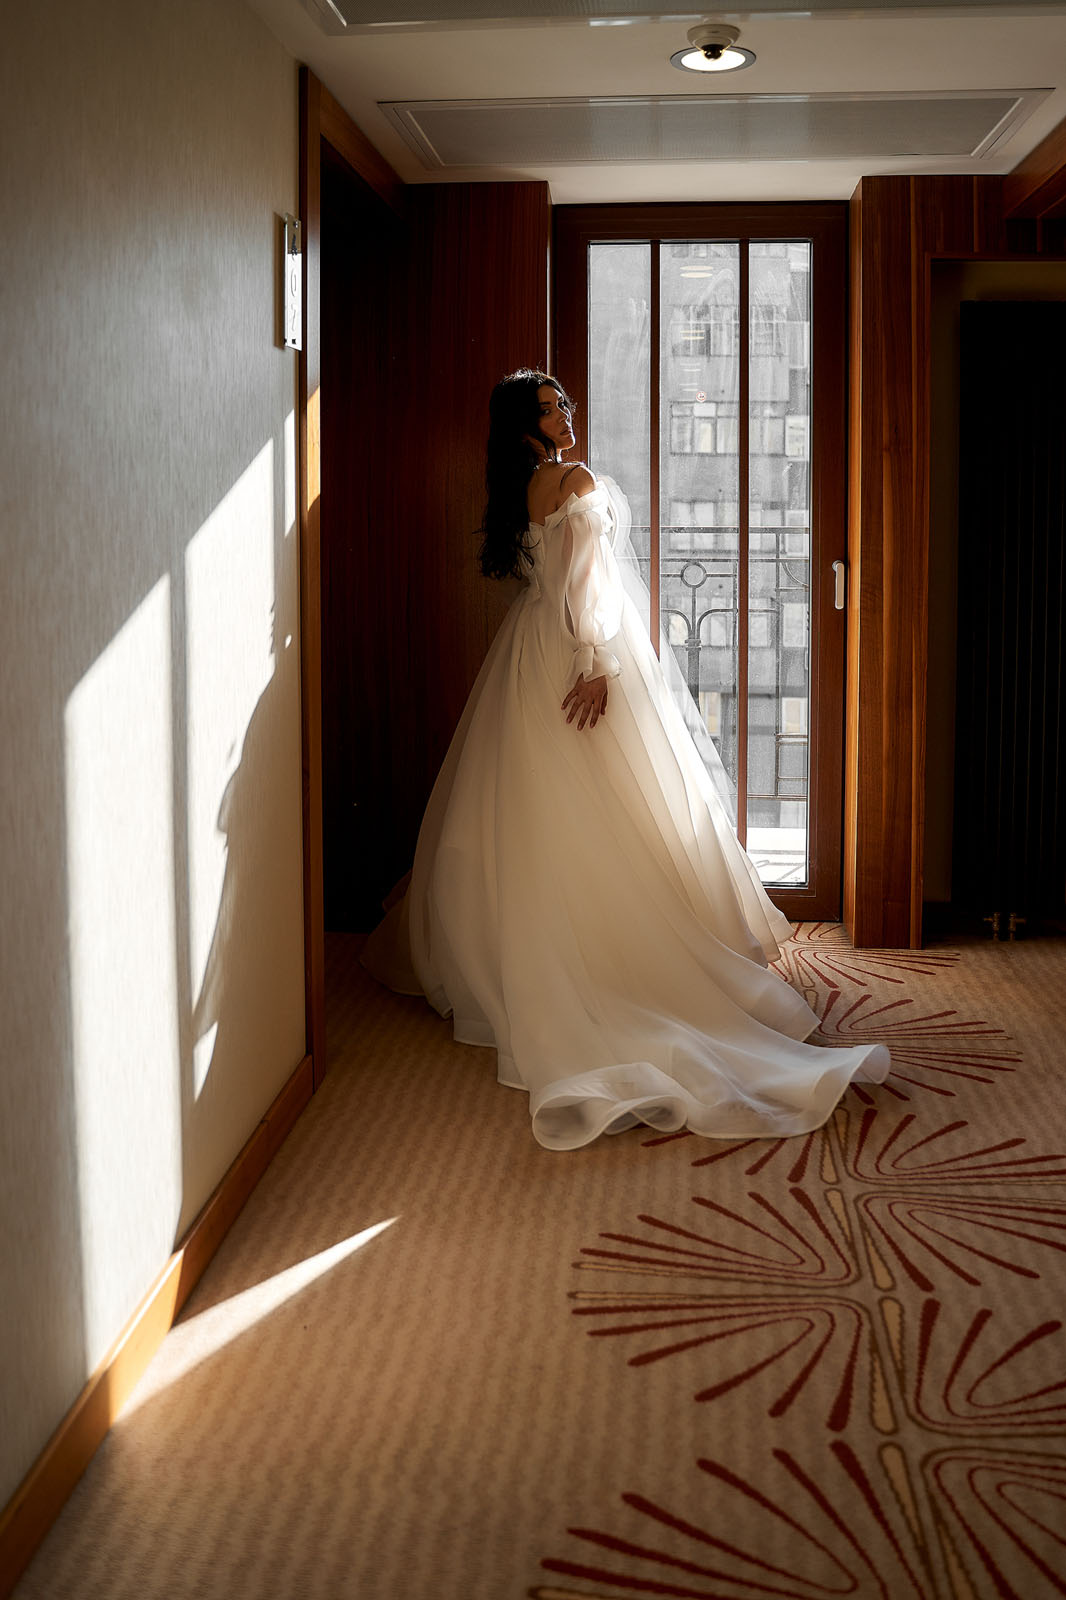 wedding@bekarev2021-04-10-09-06-48.jpg